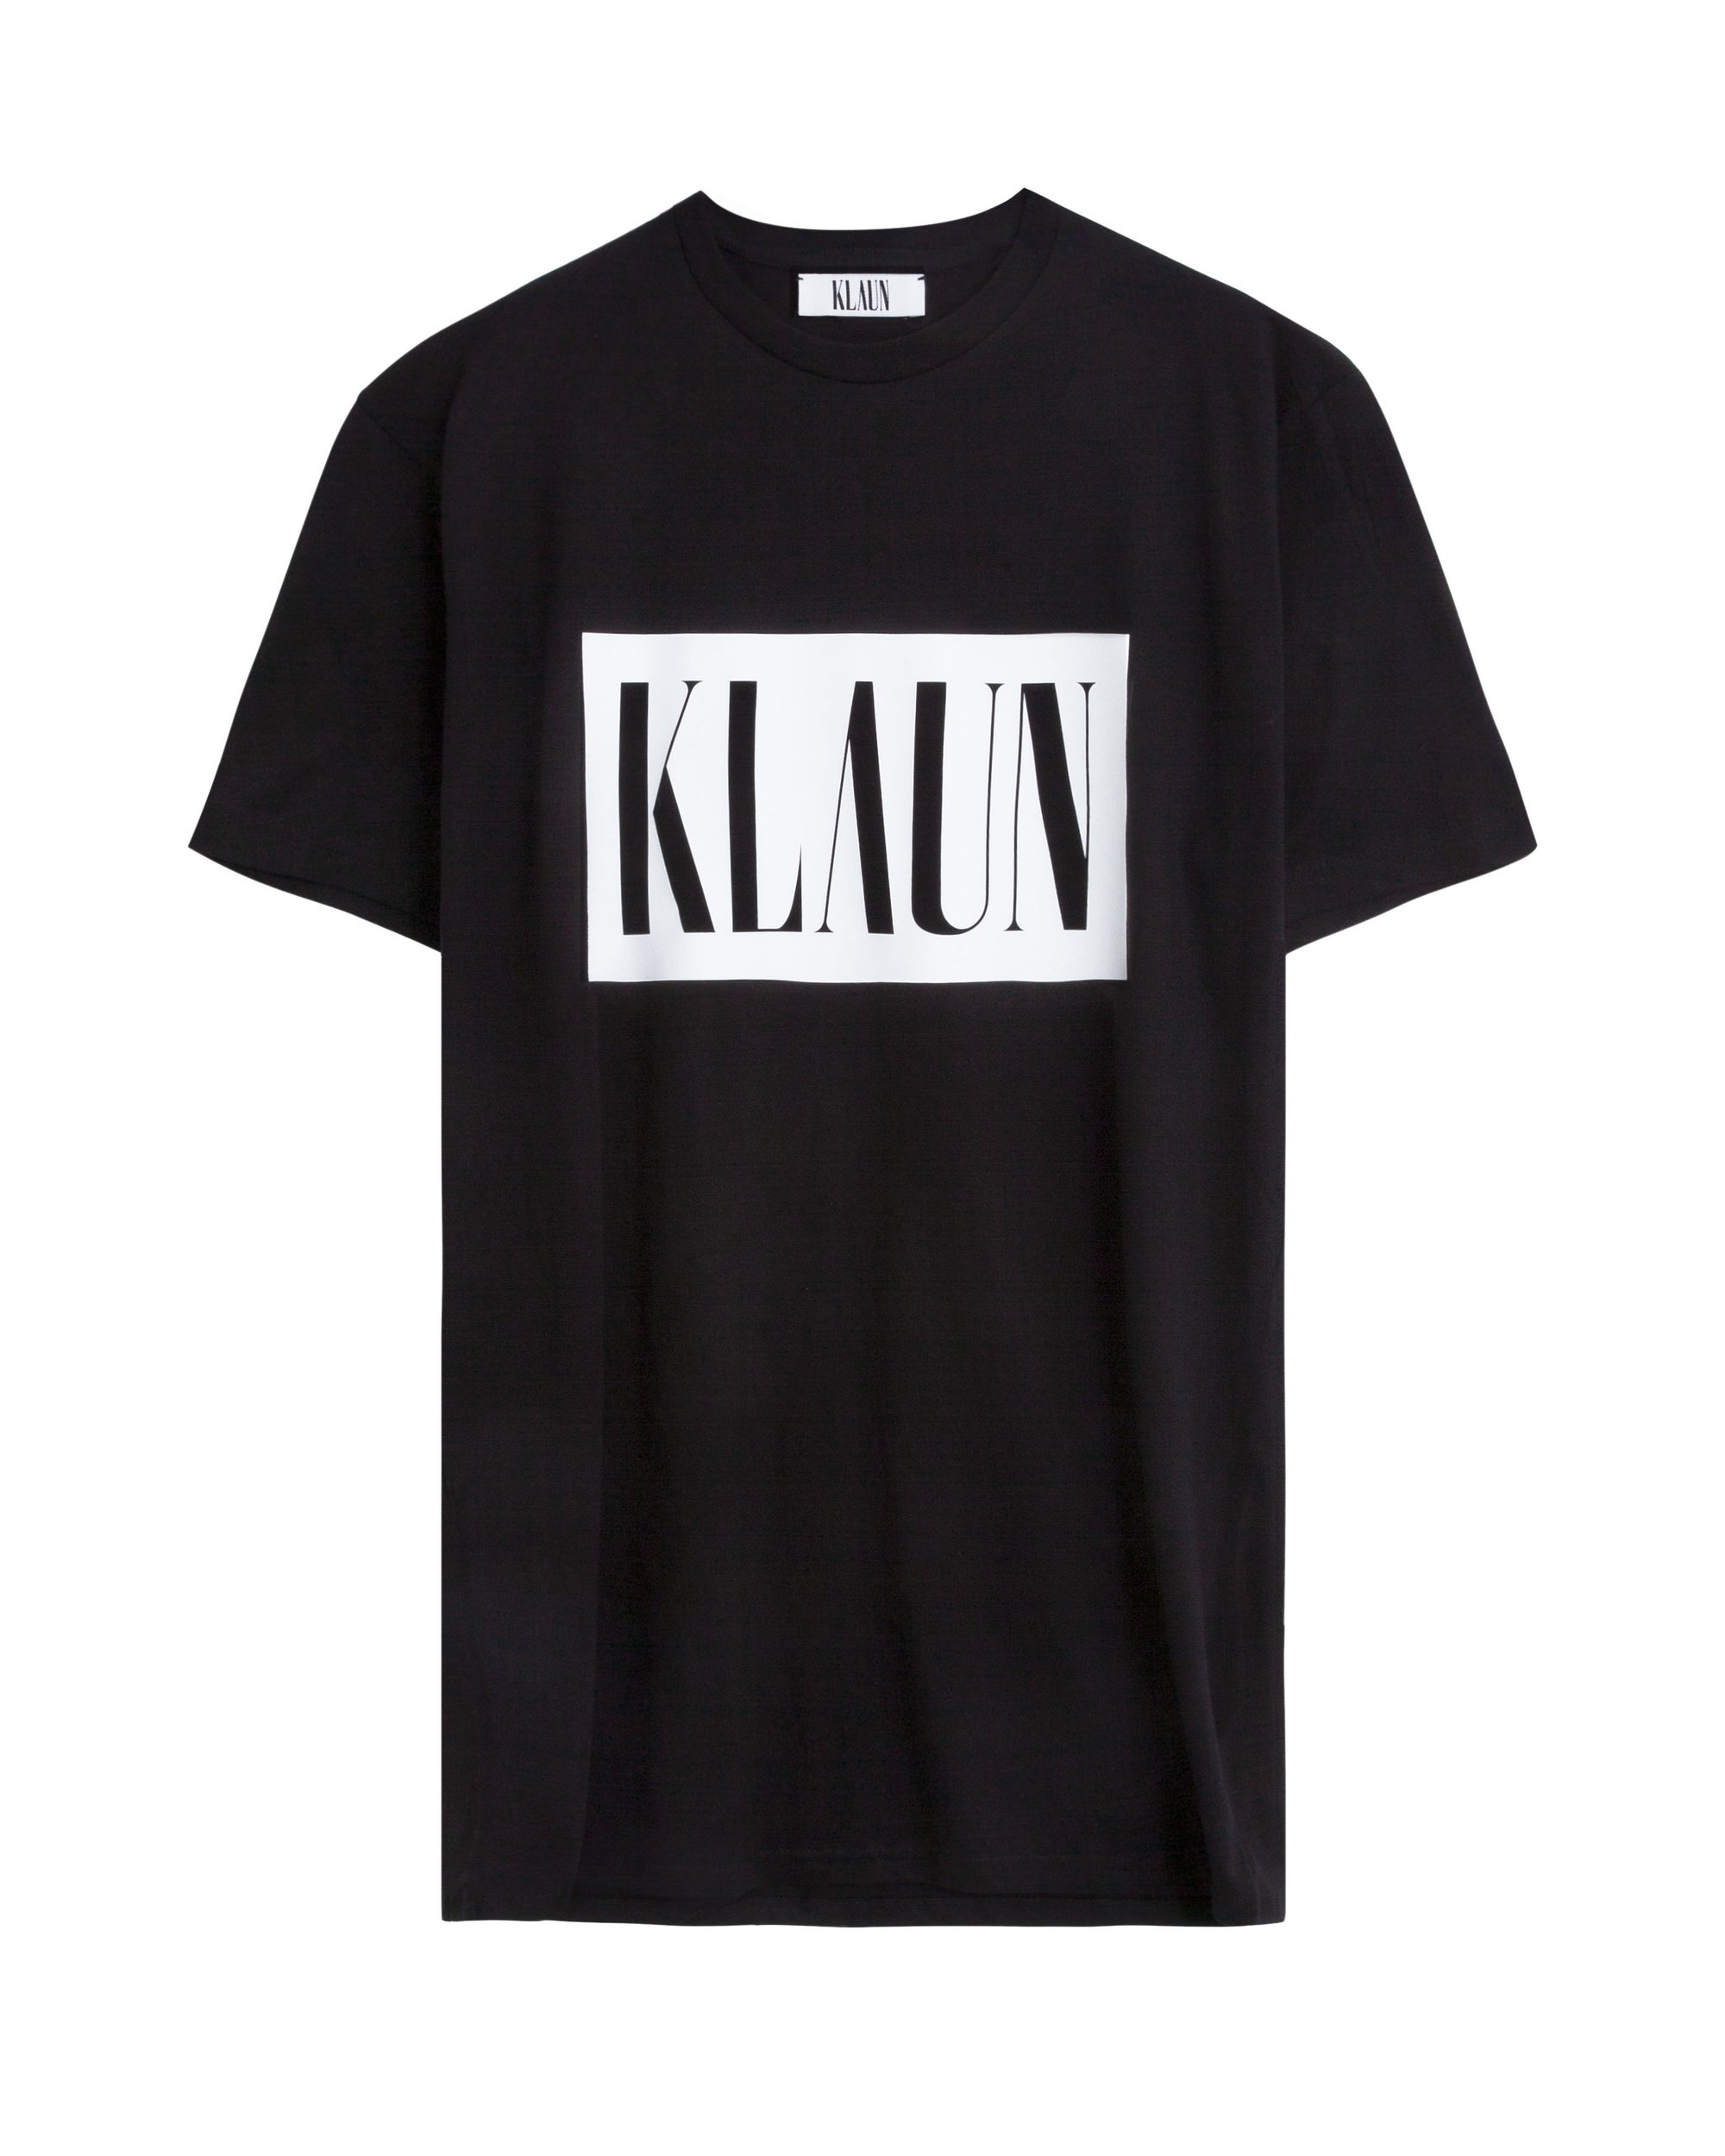 Image of Logo T-shirt Black